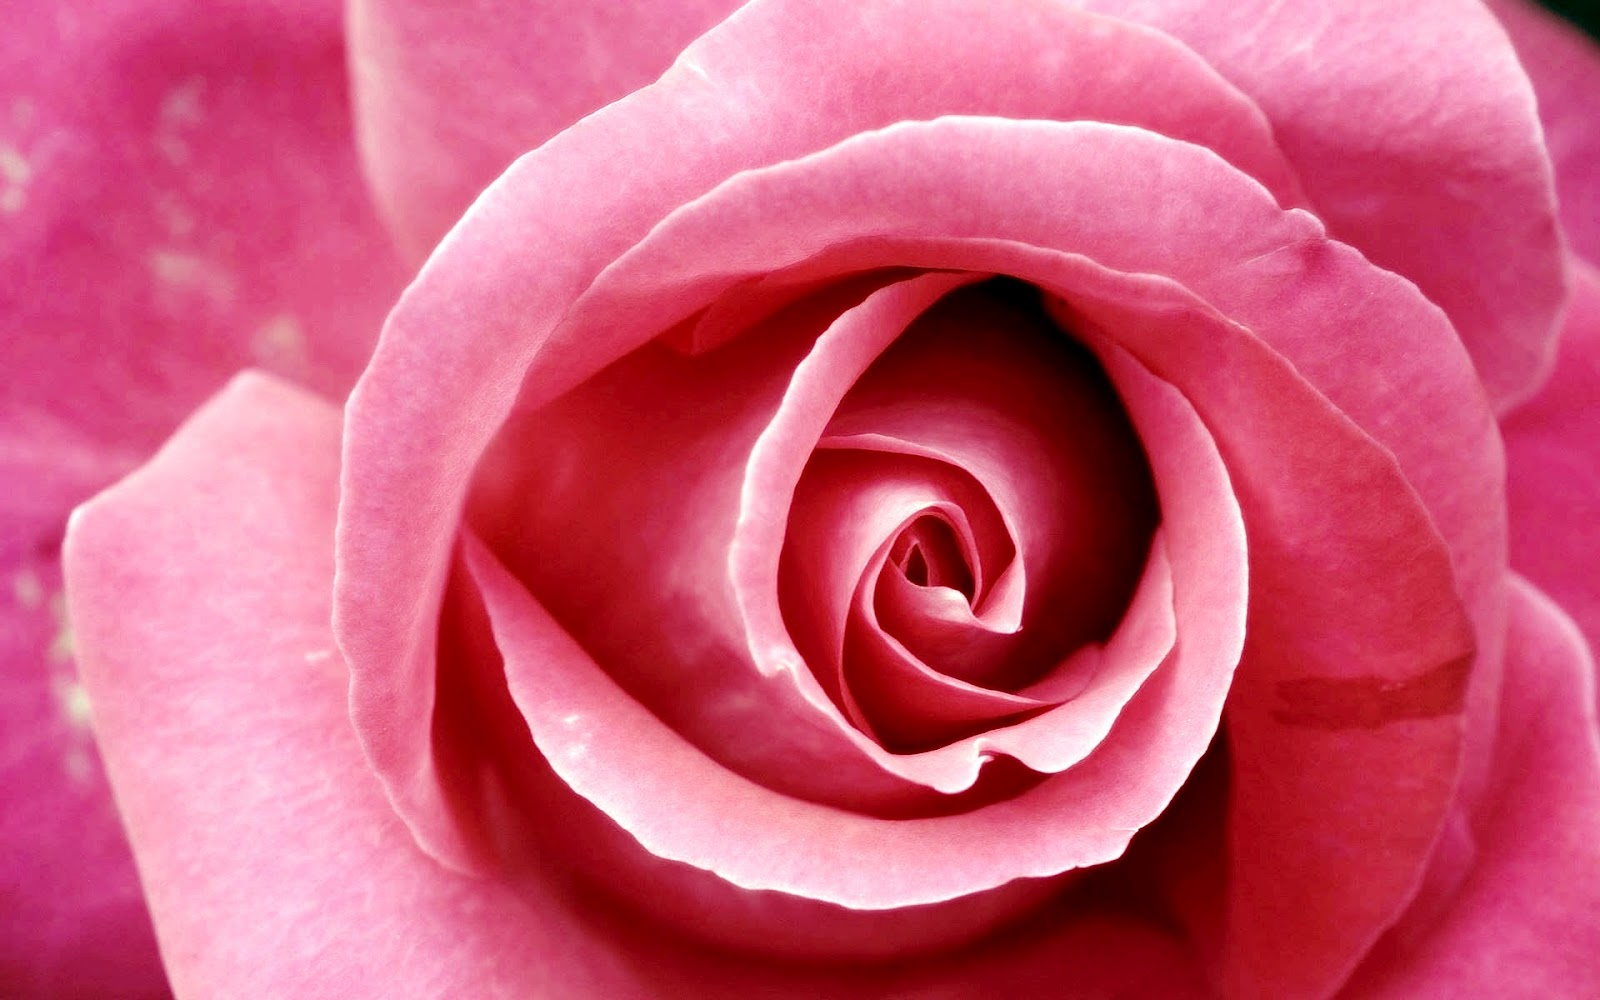 http://4.bp.blogspot.com/-qoJ84B3C-Hg/T0a-k9WAiaI/AAAAAAAADwo/zZ1ydGFowcA/s1600/beautiful_pink_rose-wide.jpg